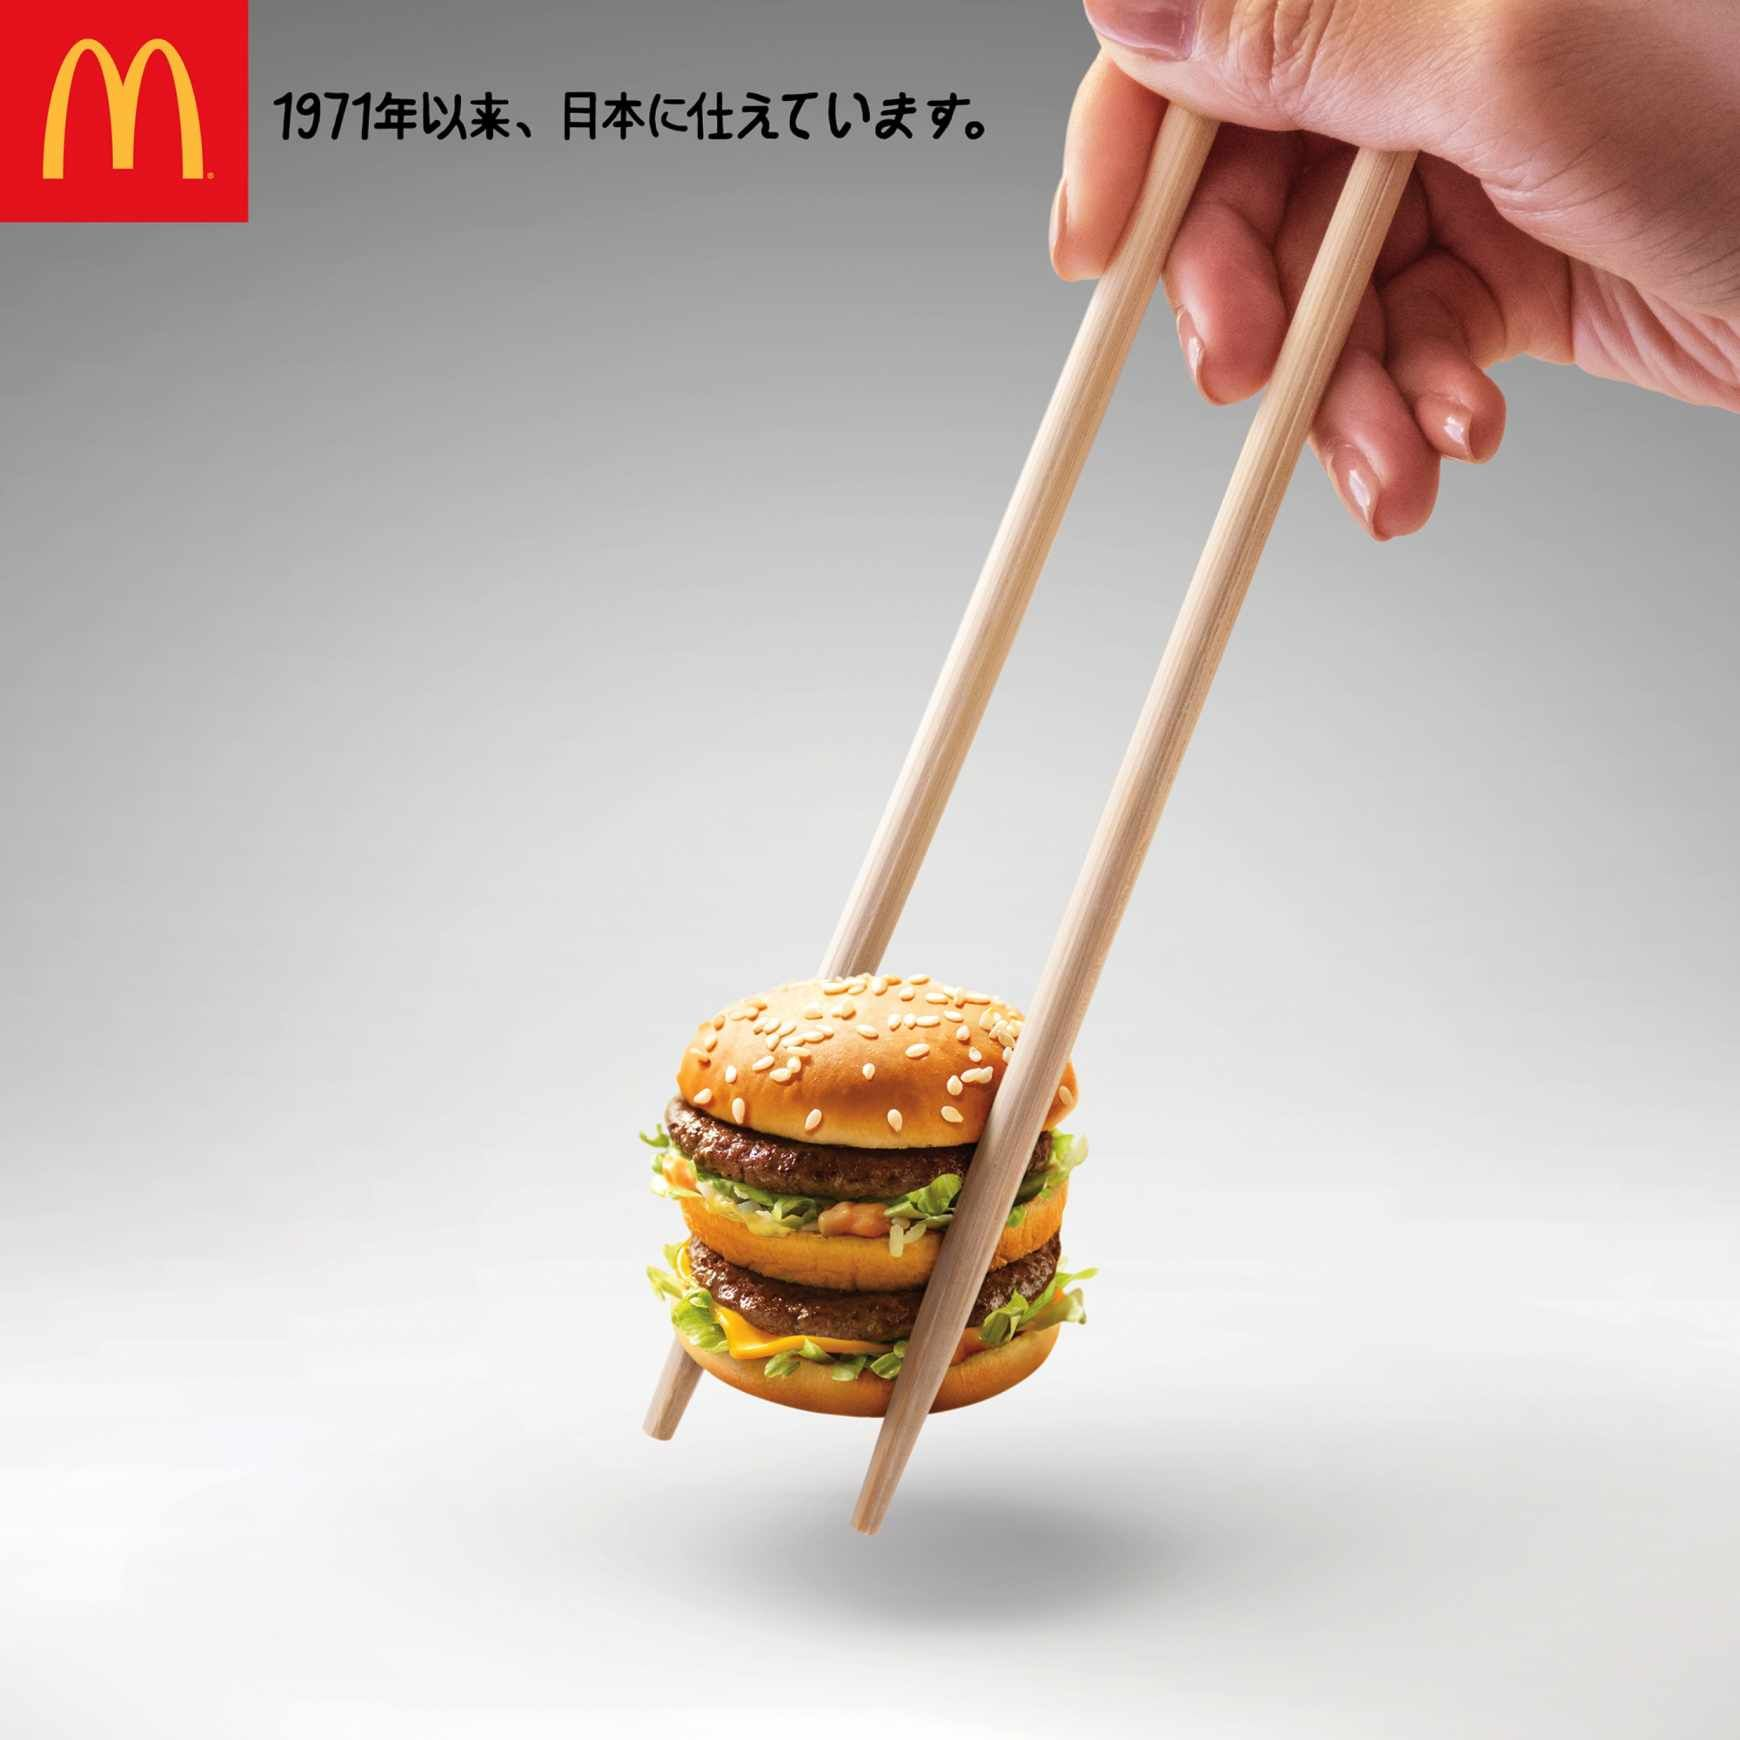 McDonald\'s: Japan   Advertising:)   Pinterest   Japan, Ads and ...